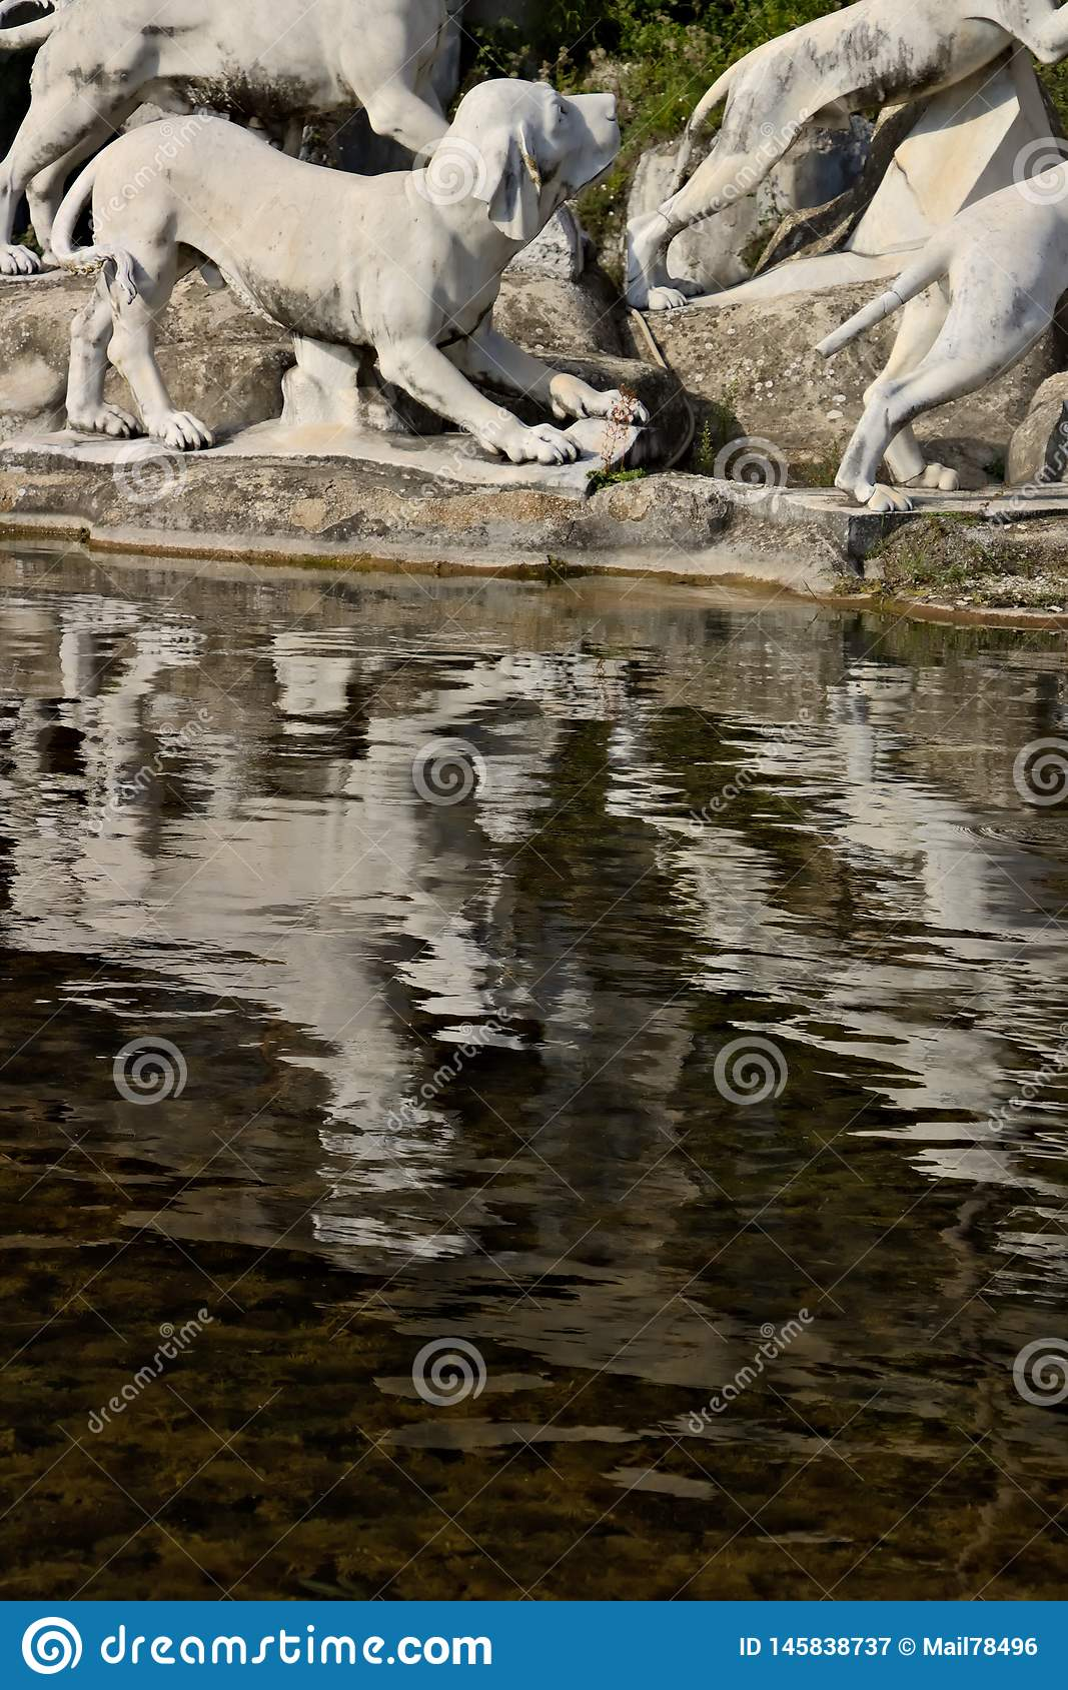 Reggia二卡塞尔塔,意大利 10/27/2018 有雕塑的巨大的喷泉在白色大理石